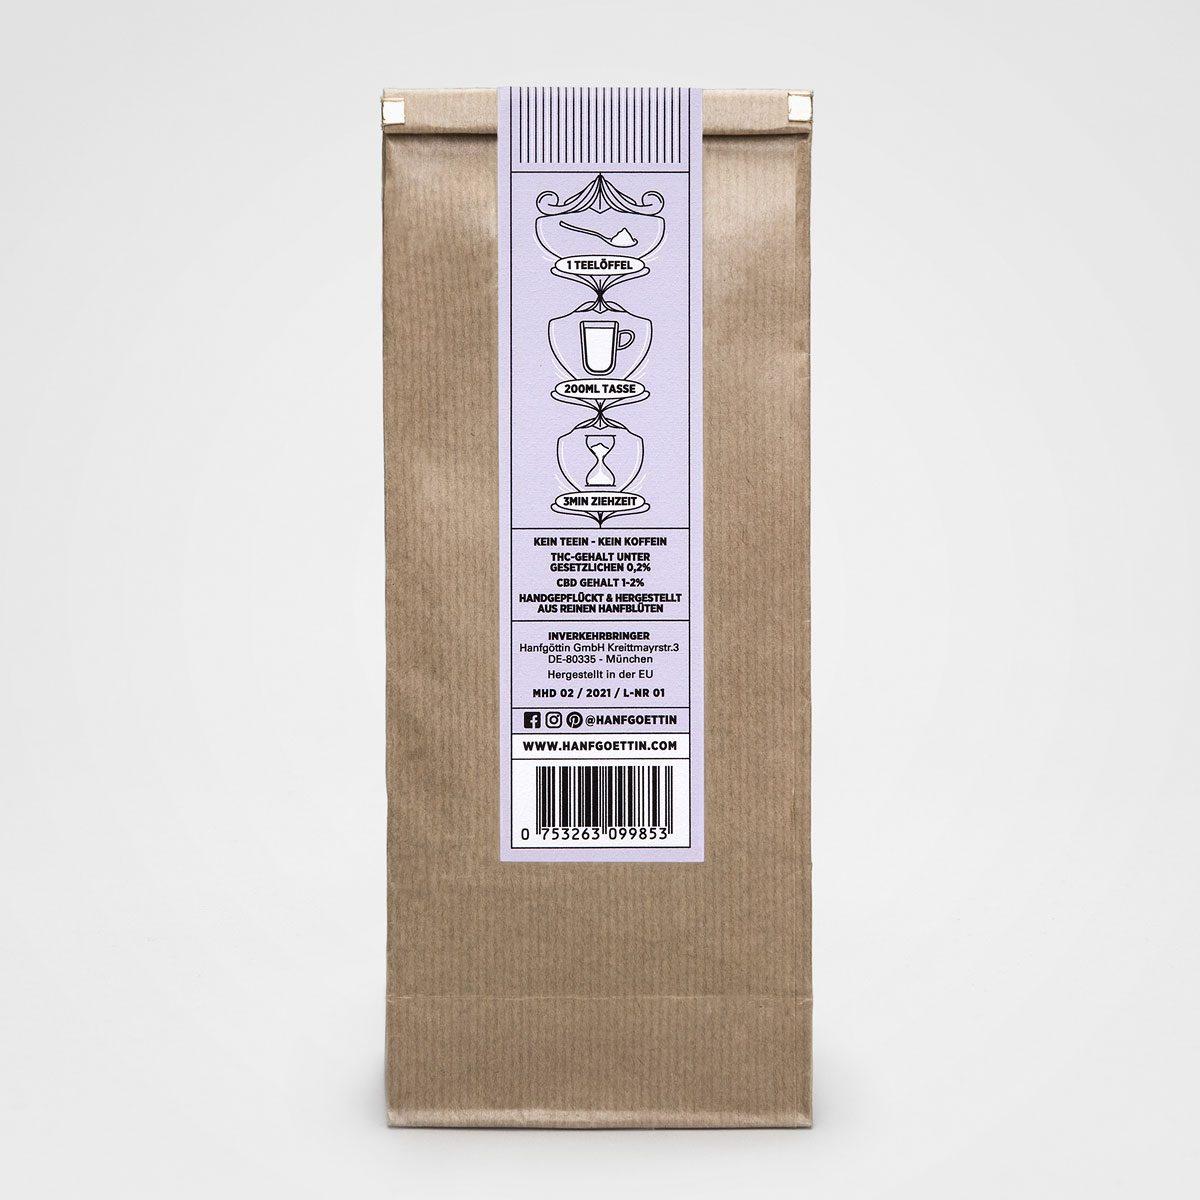 Verbene Tee Hanfmischung mit CBD HANFGÖTTIN